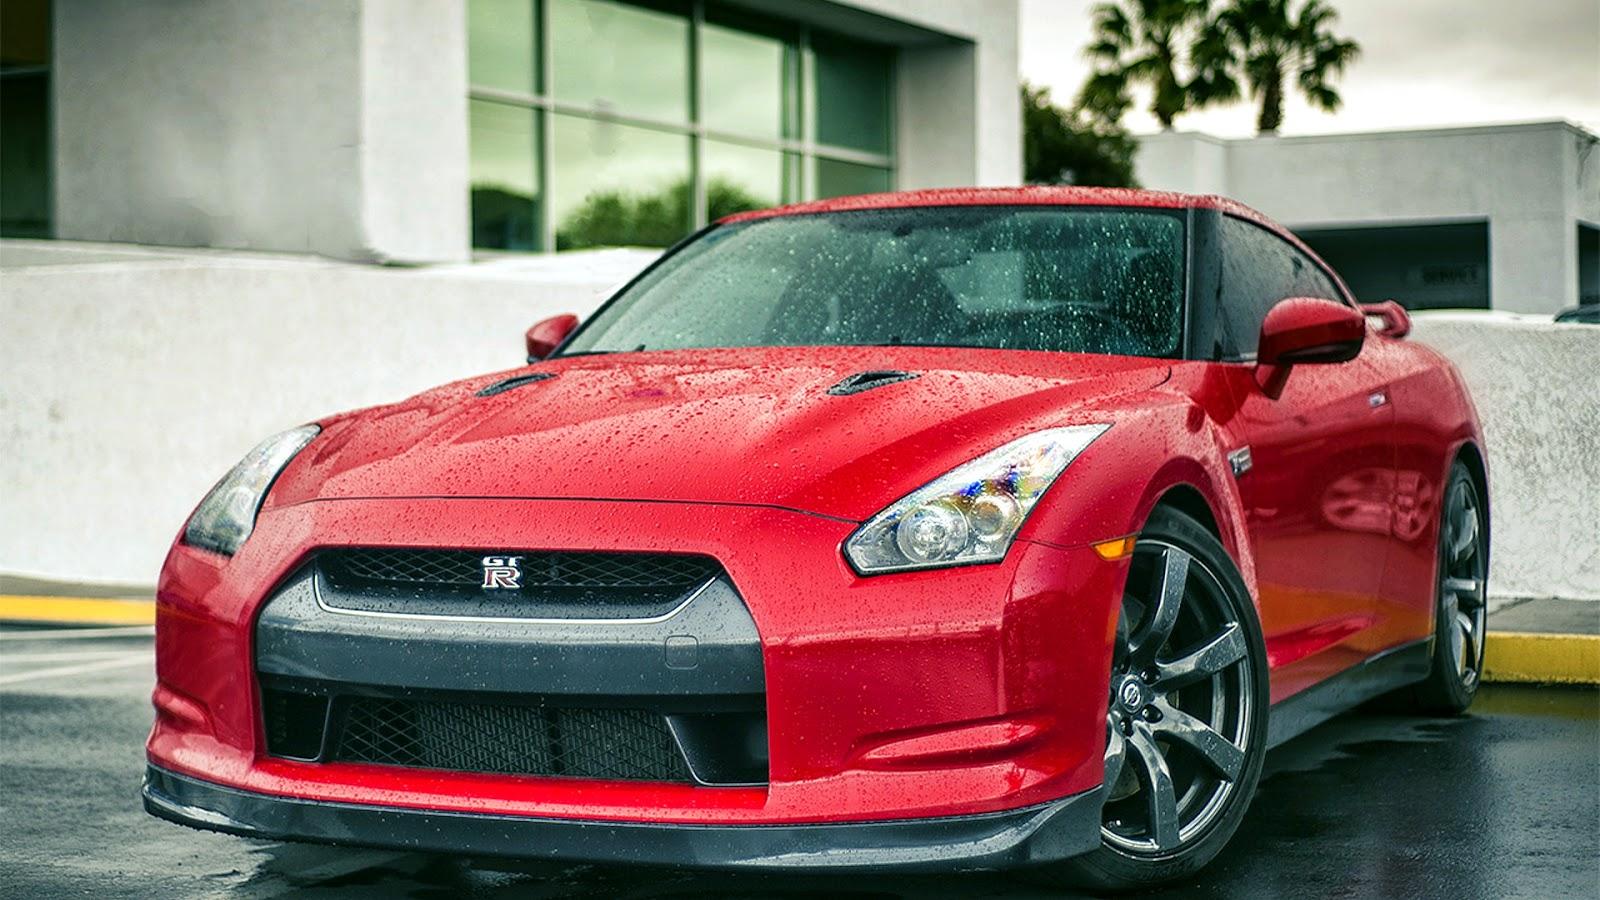 Google Wallpaper Hd Nissan Gtr Wallpaper Hd Hd Wallpaper With Cars